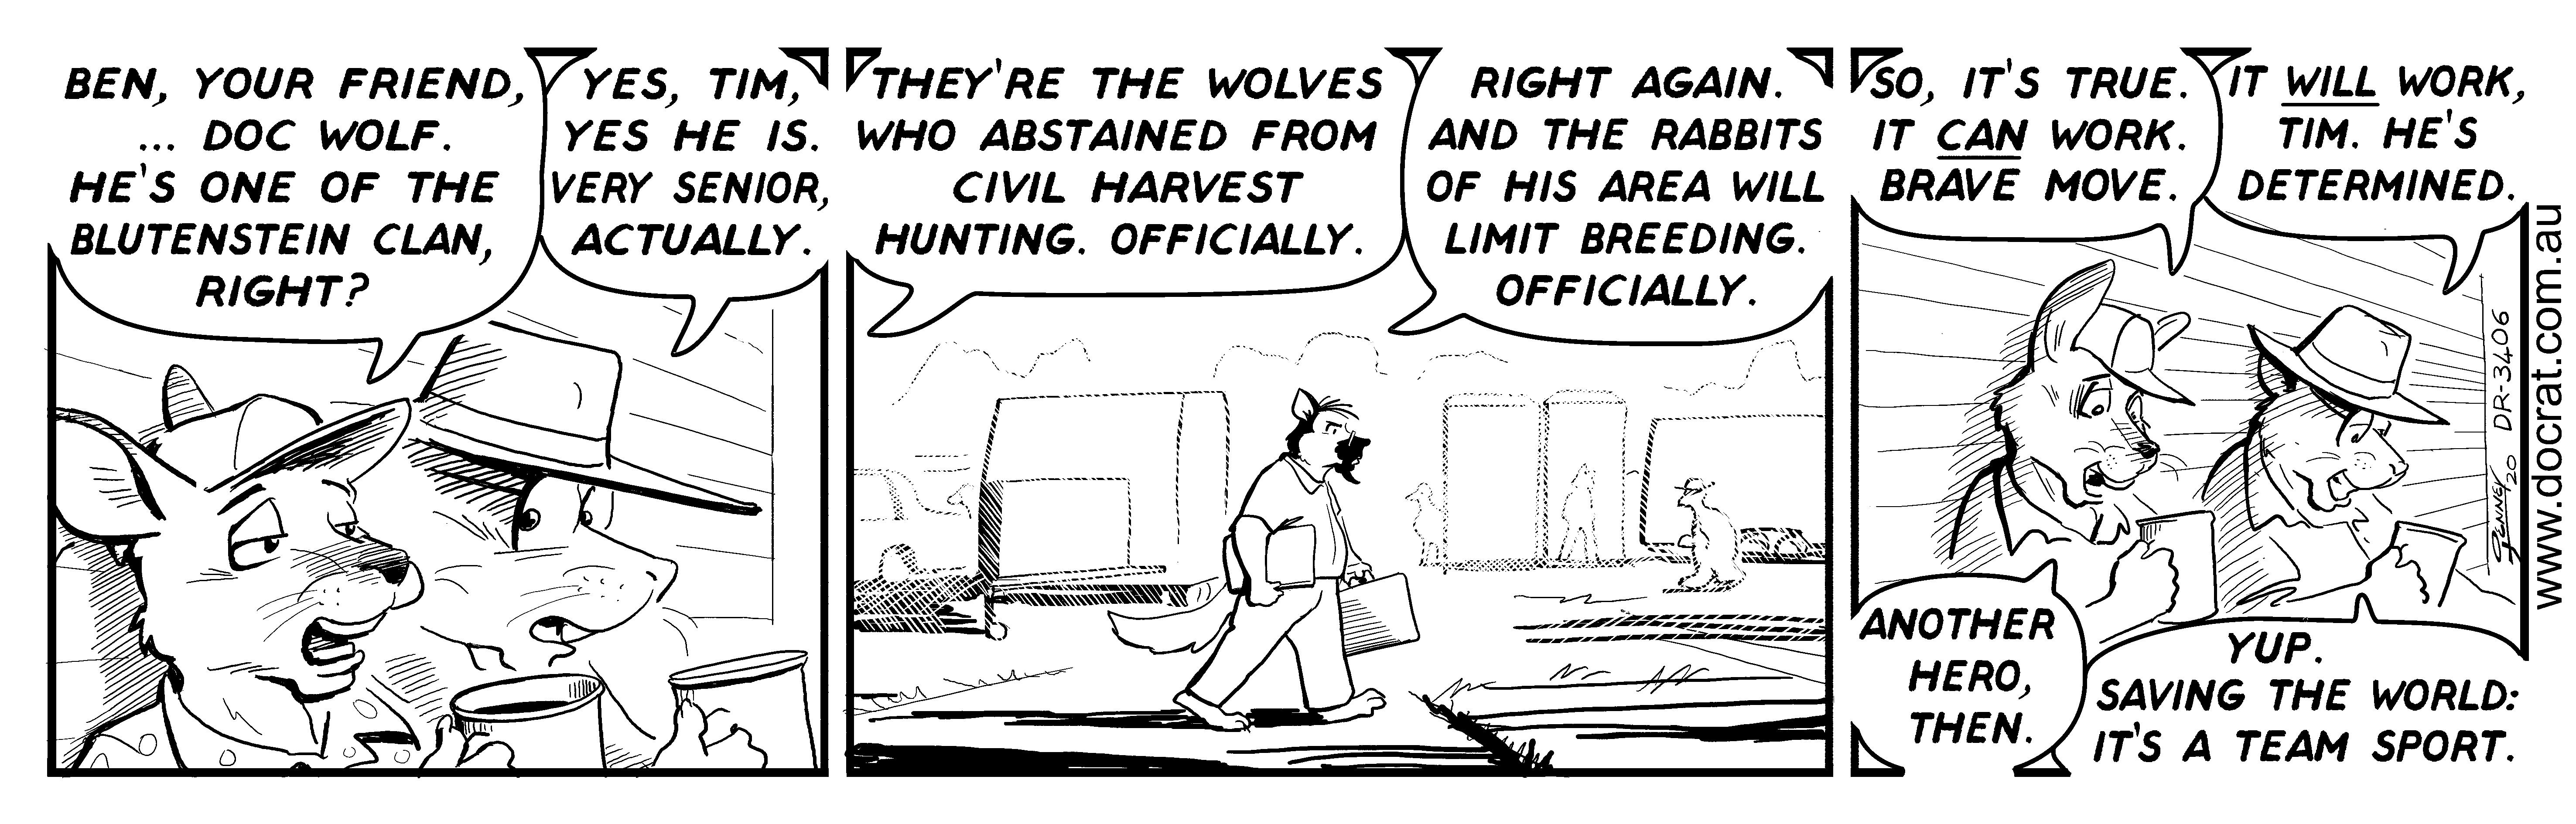 20200203